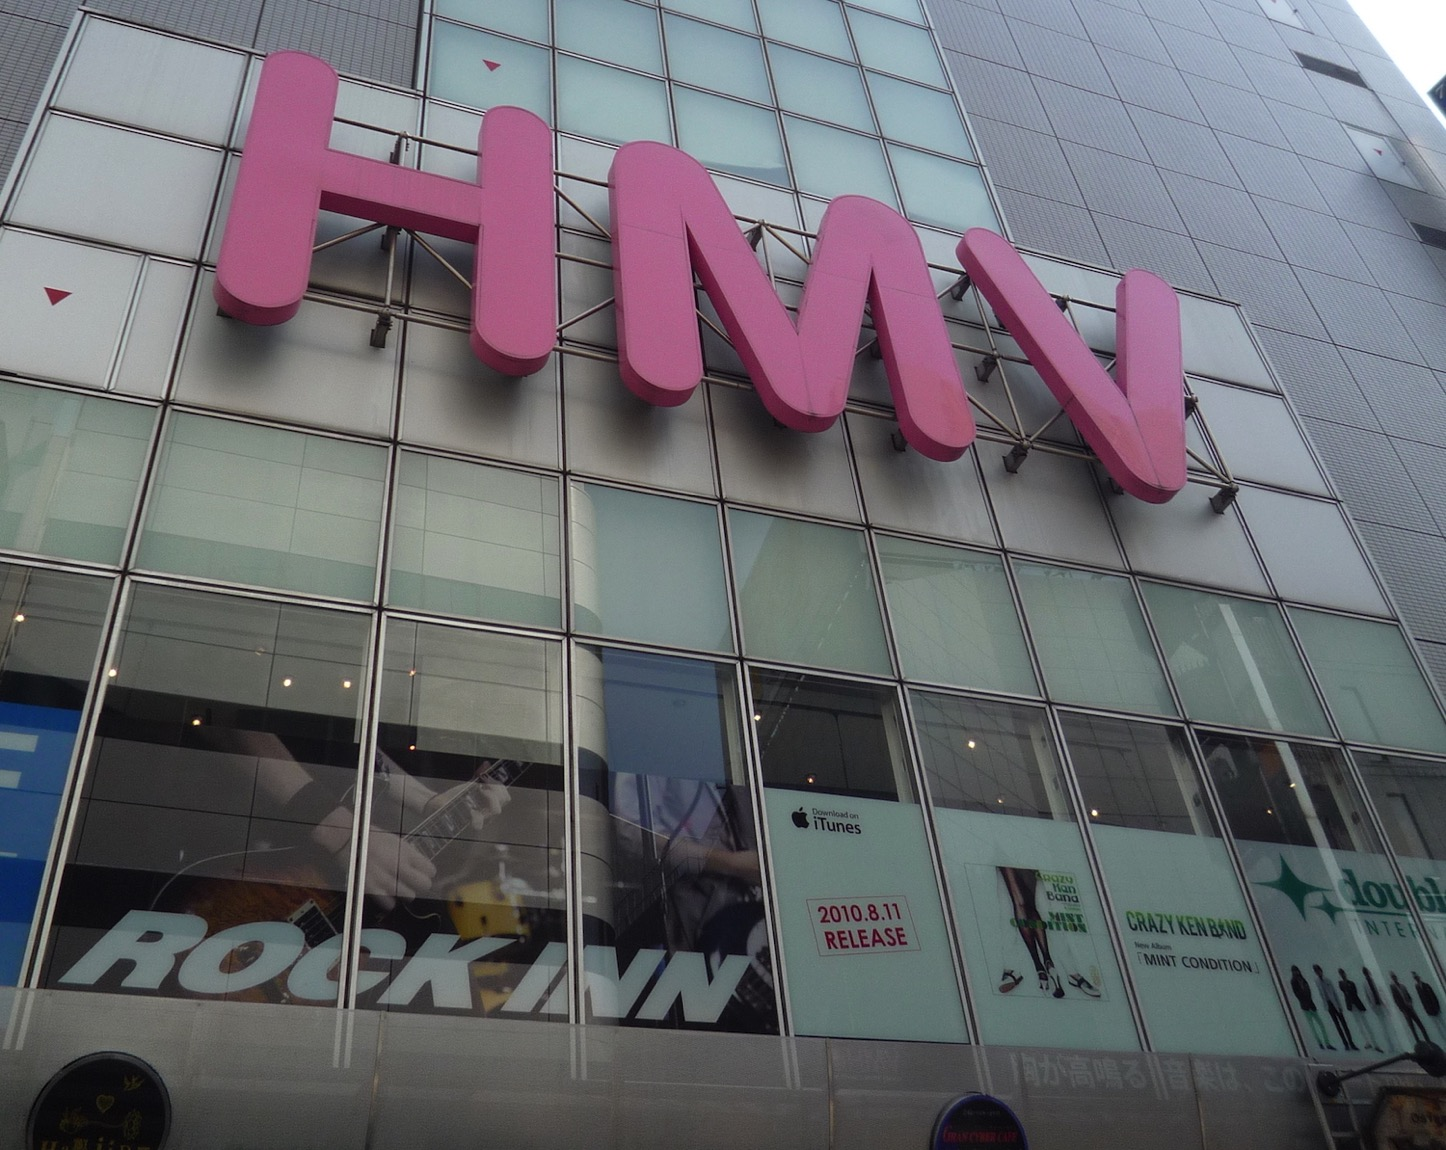 Shibuya hmv